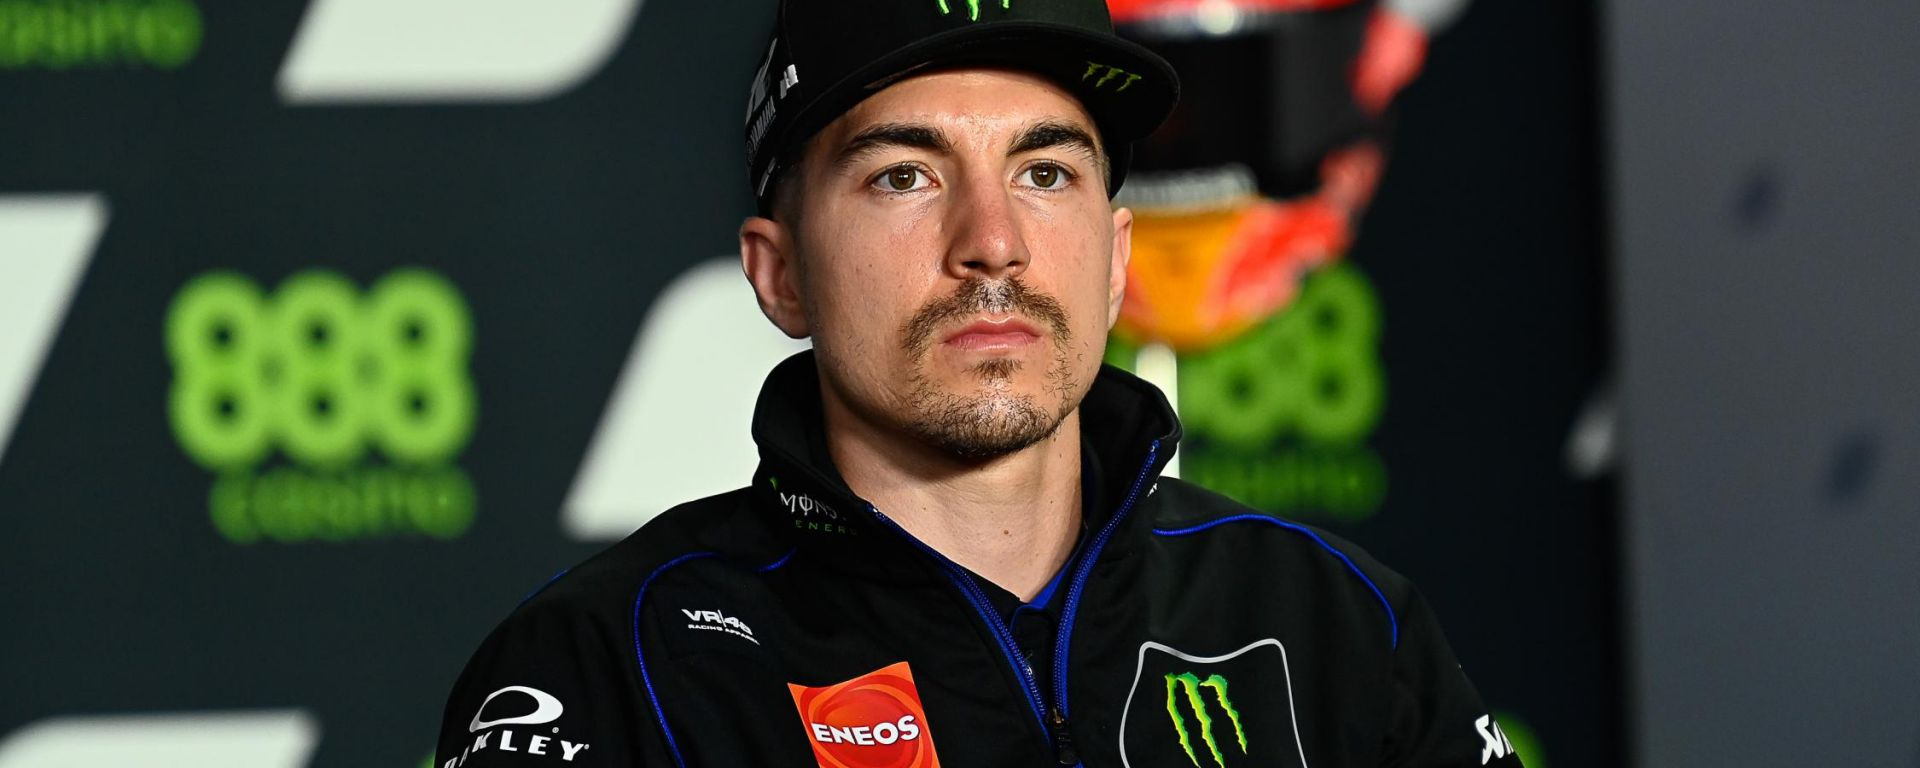 MotoGP Portogallo 2021, Portimao: Maverick Vinales (Yamaha)